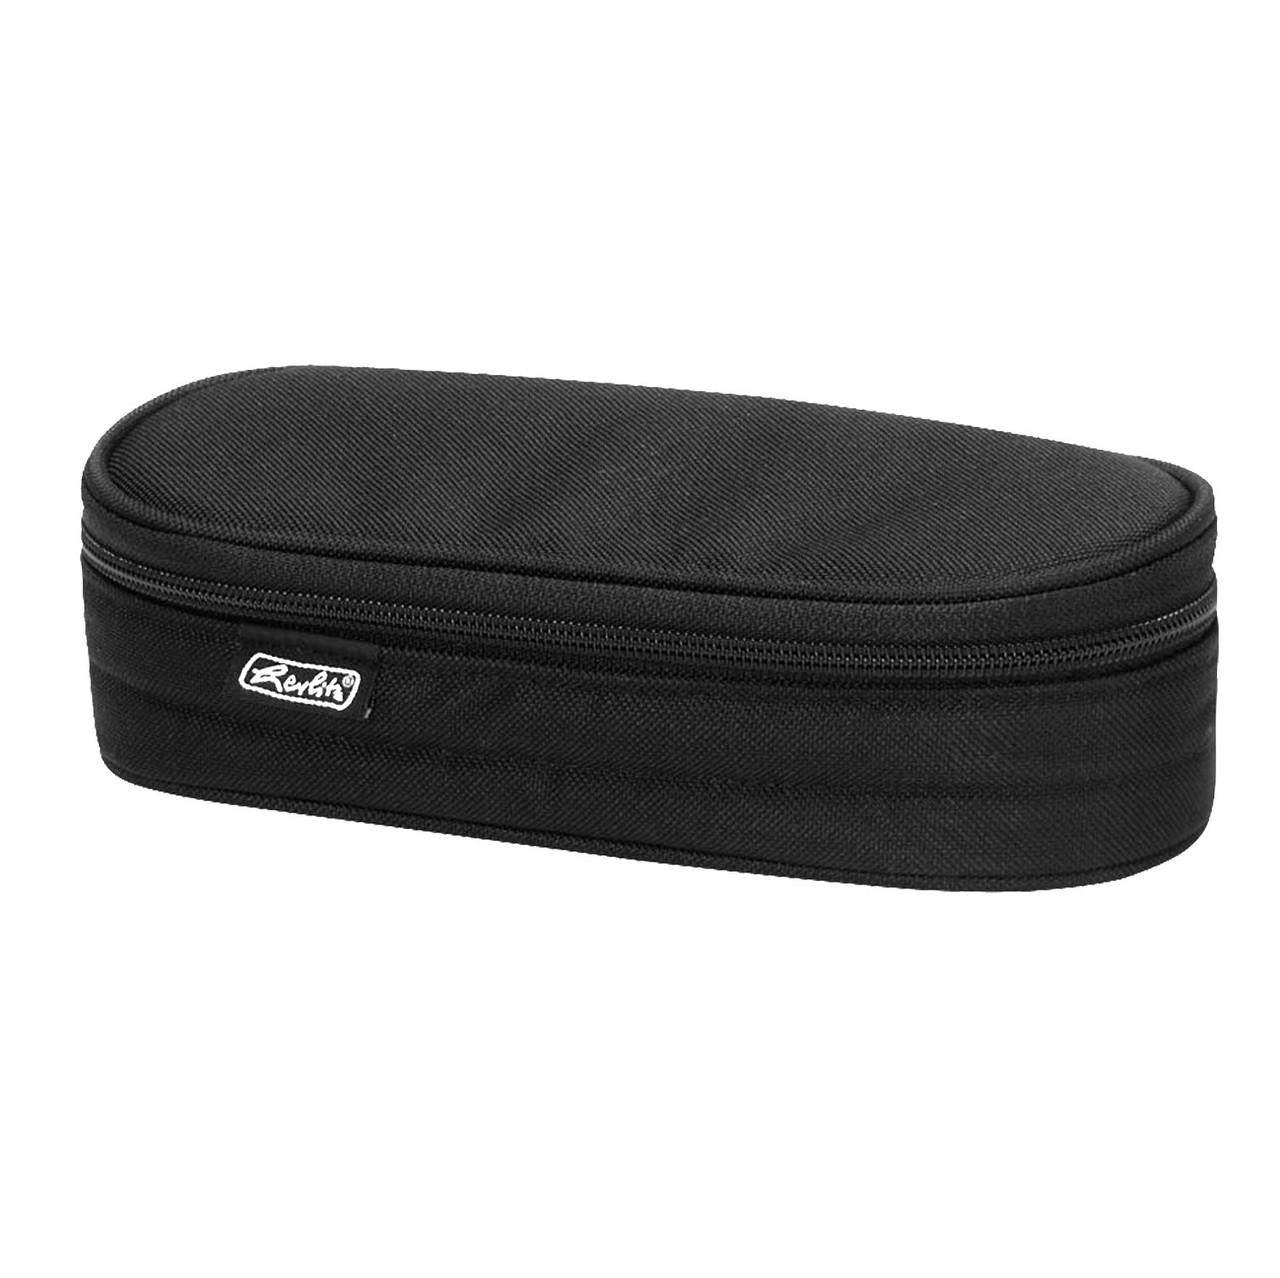 Пенал Herlitz Be.Bag Case Black (11415924)